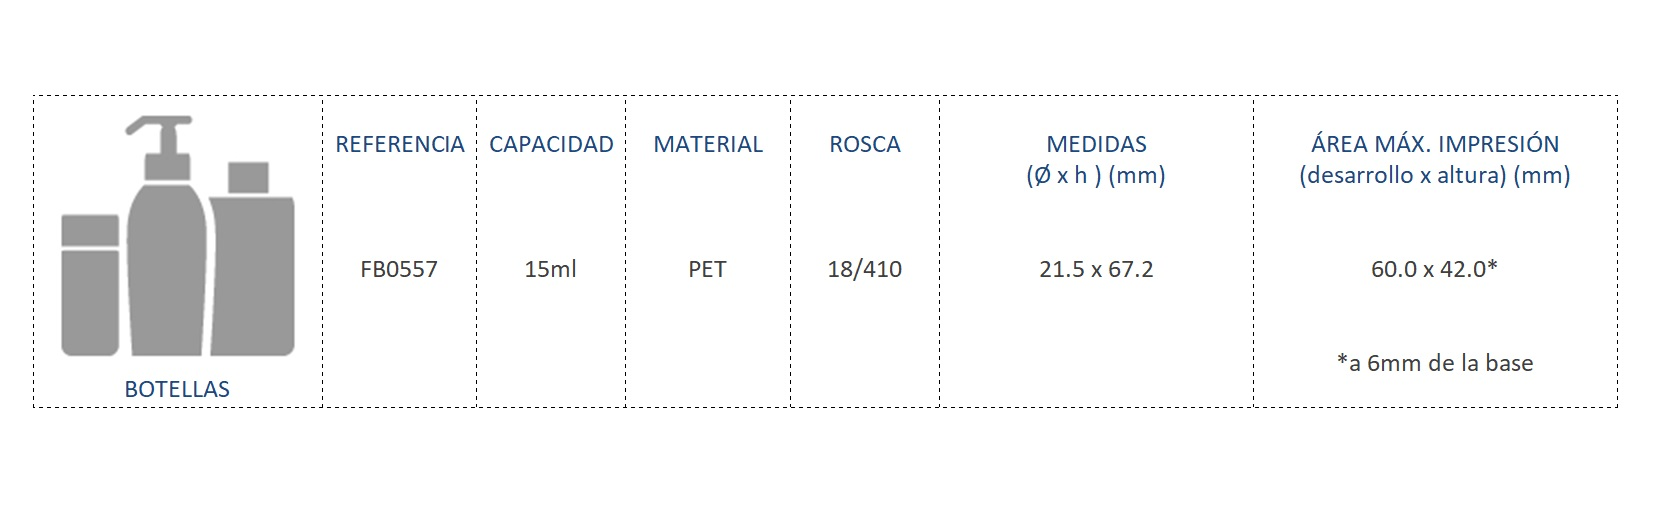 Cuadro de materiales FB0557